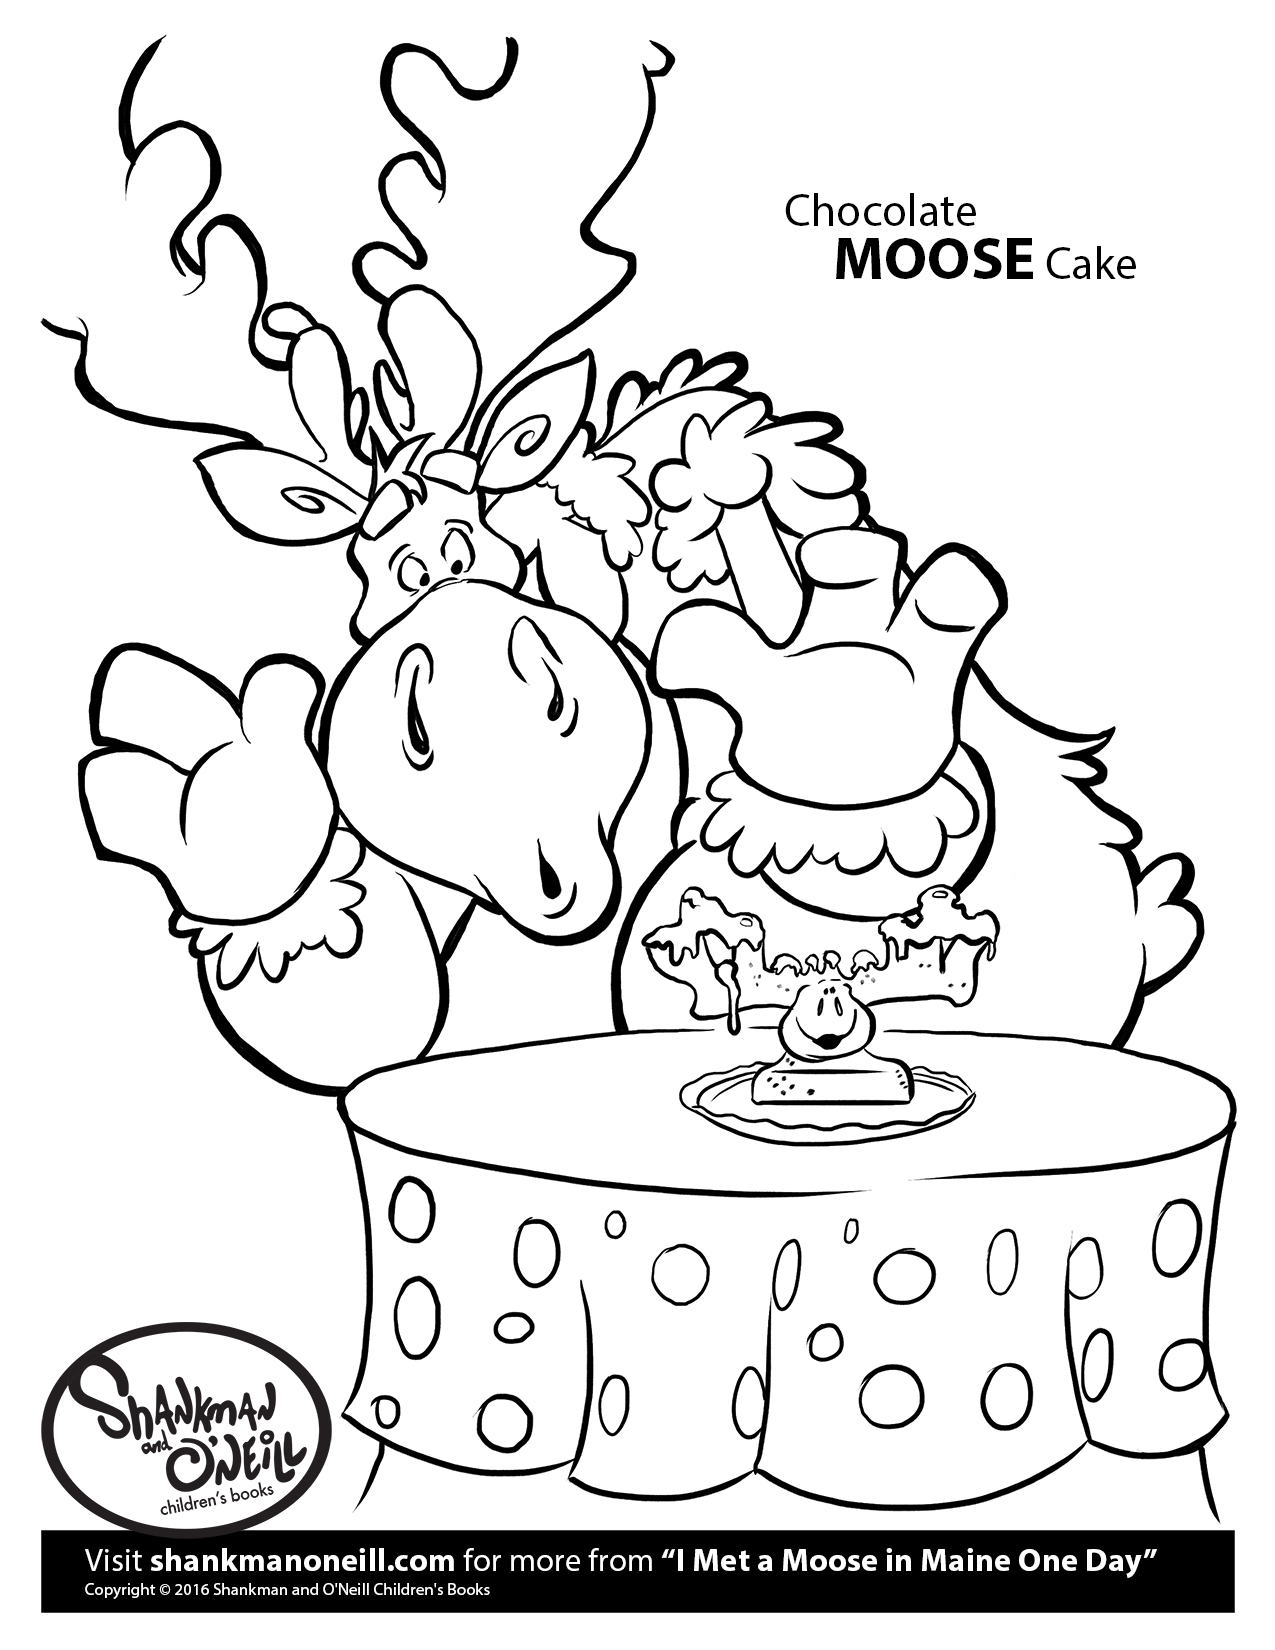 960x720 children 39s coloring books 1275x1650 shankman o 39neill children 39s books children drawing books at getdrawings free